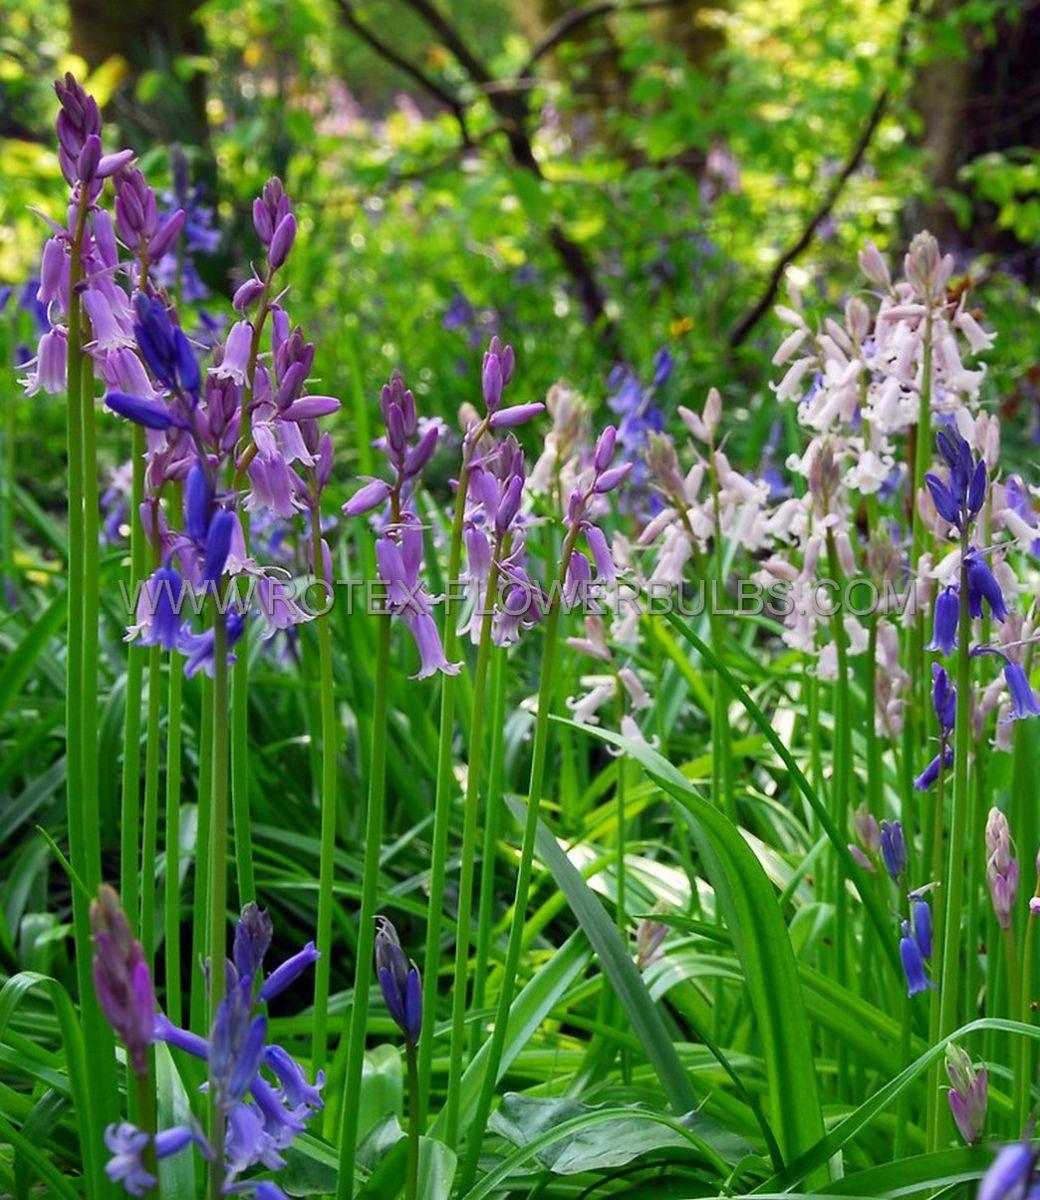 miscellaneous scilla hyacinthoides hispanica mix 810 cm 15 pkgsx 10